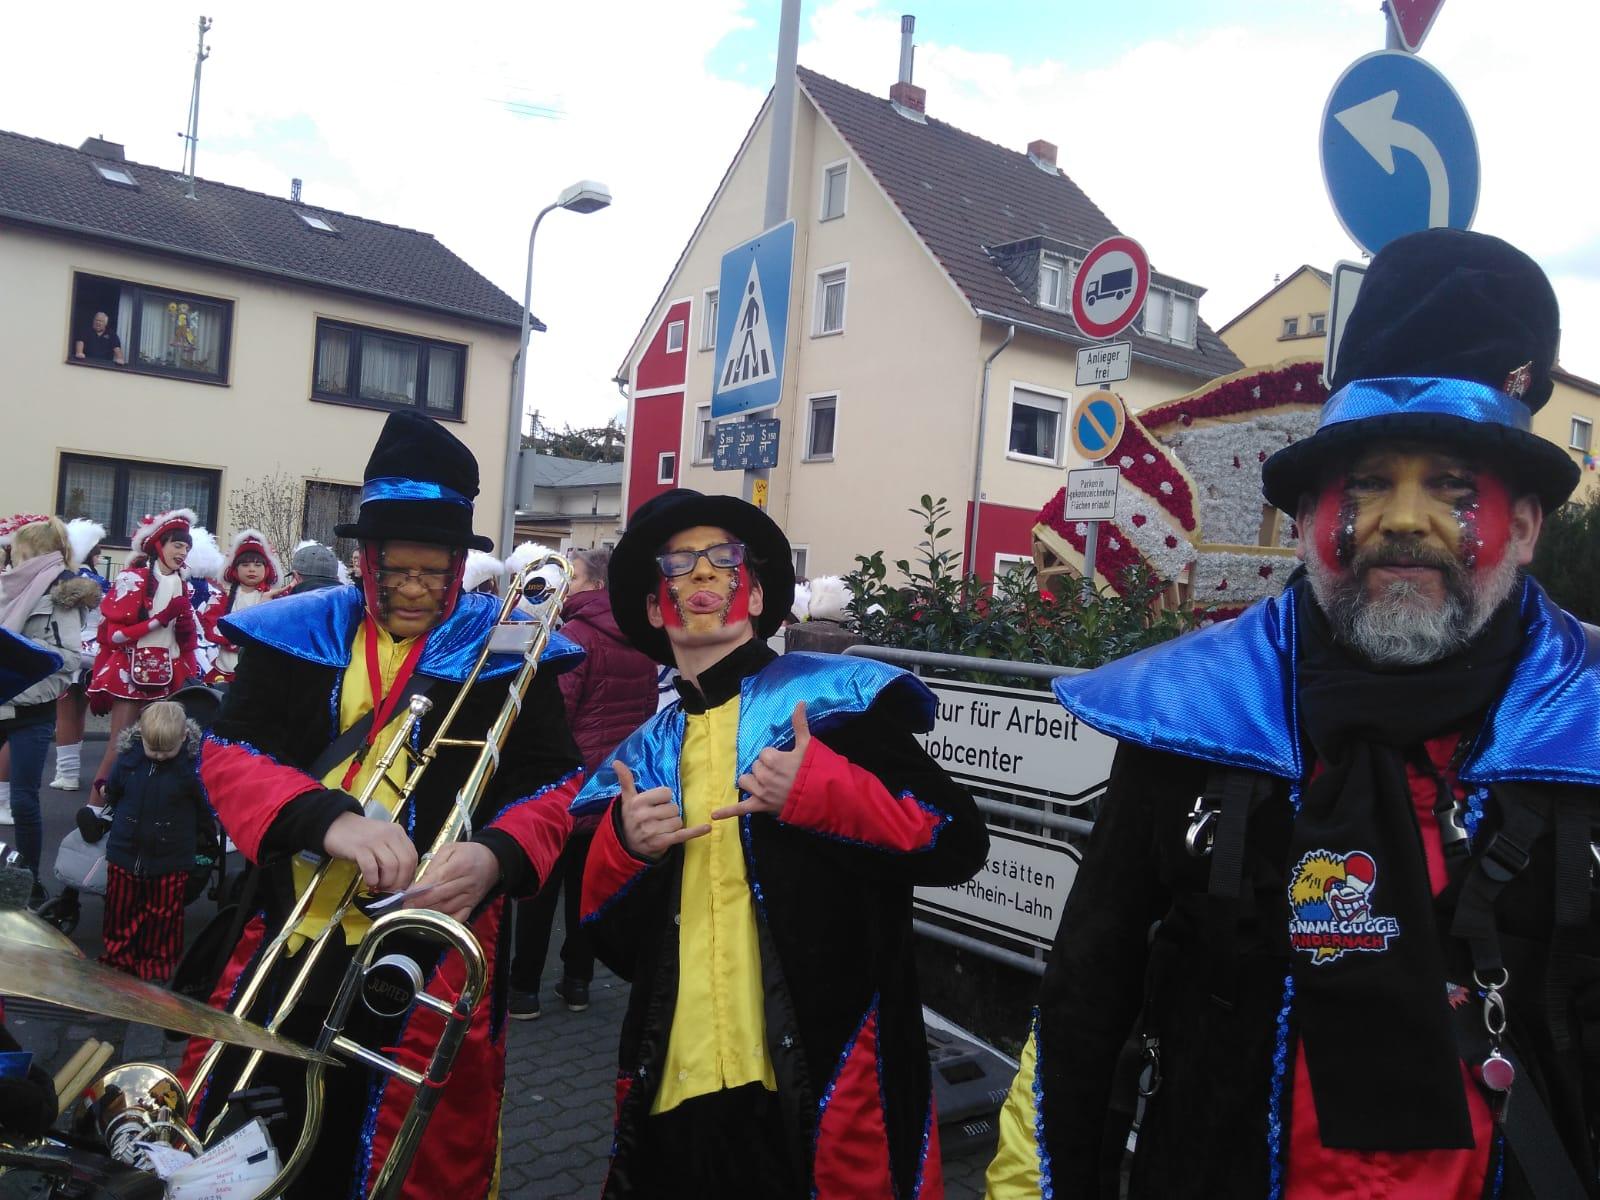 NoName-Guggen-Andernach-2020-Karneval-122